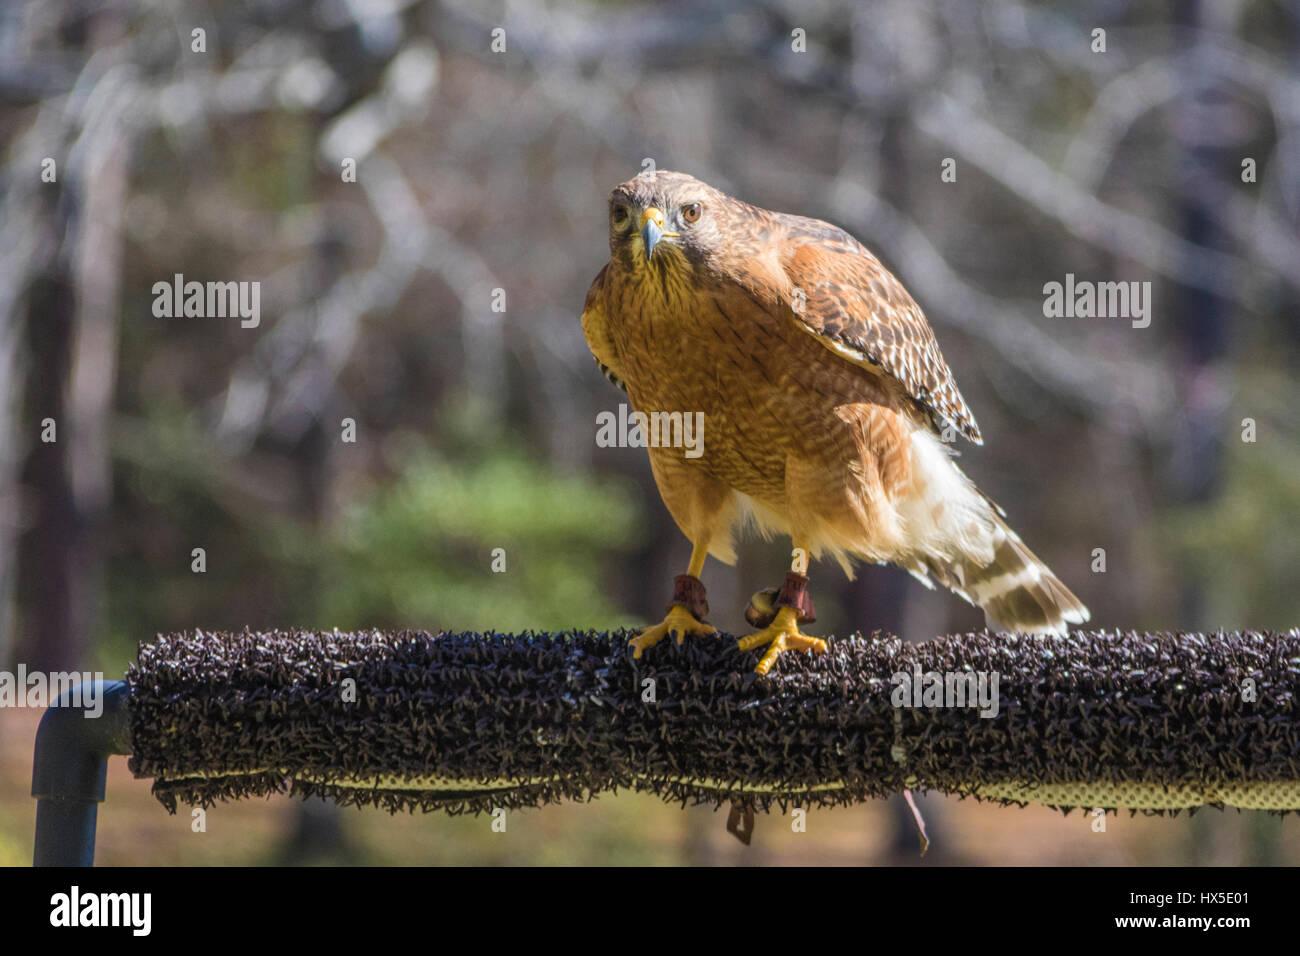 Rot-geschultert Hawk in Callaway Garden Birds Of Prey Rehabilitation und Ausbildung Programm. Stockbild